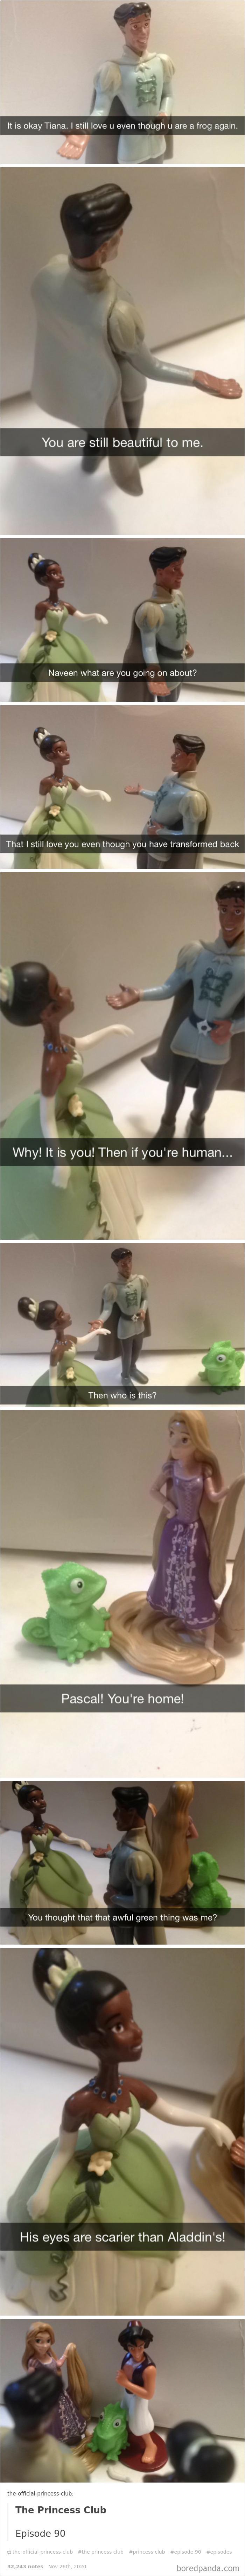 The Princess And The Pascal